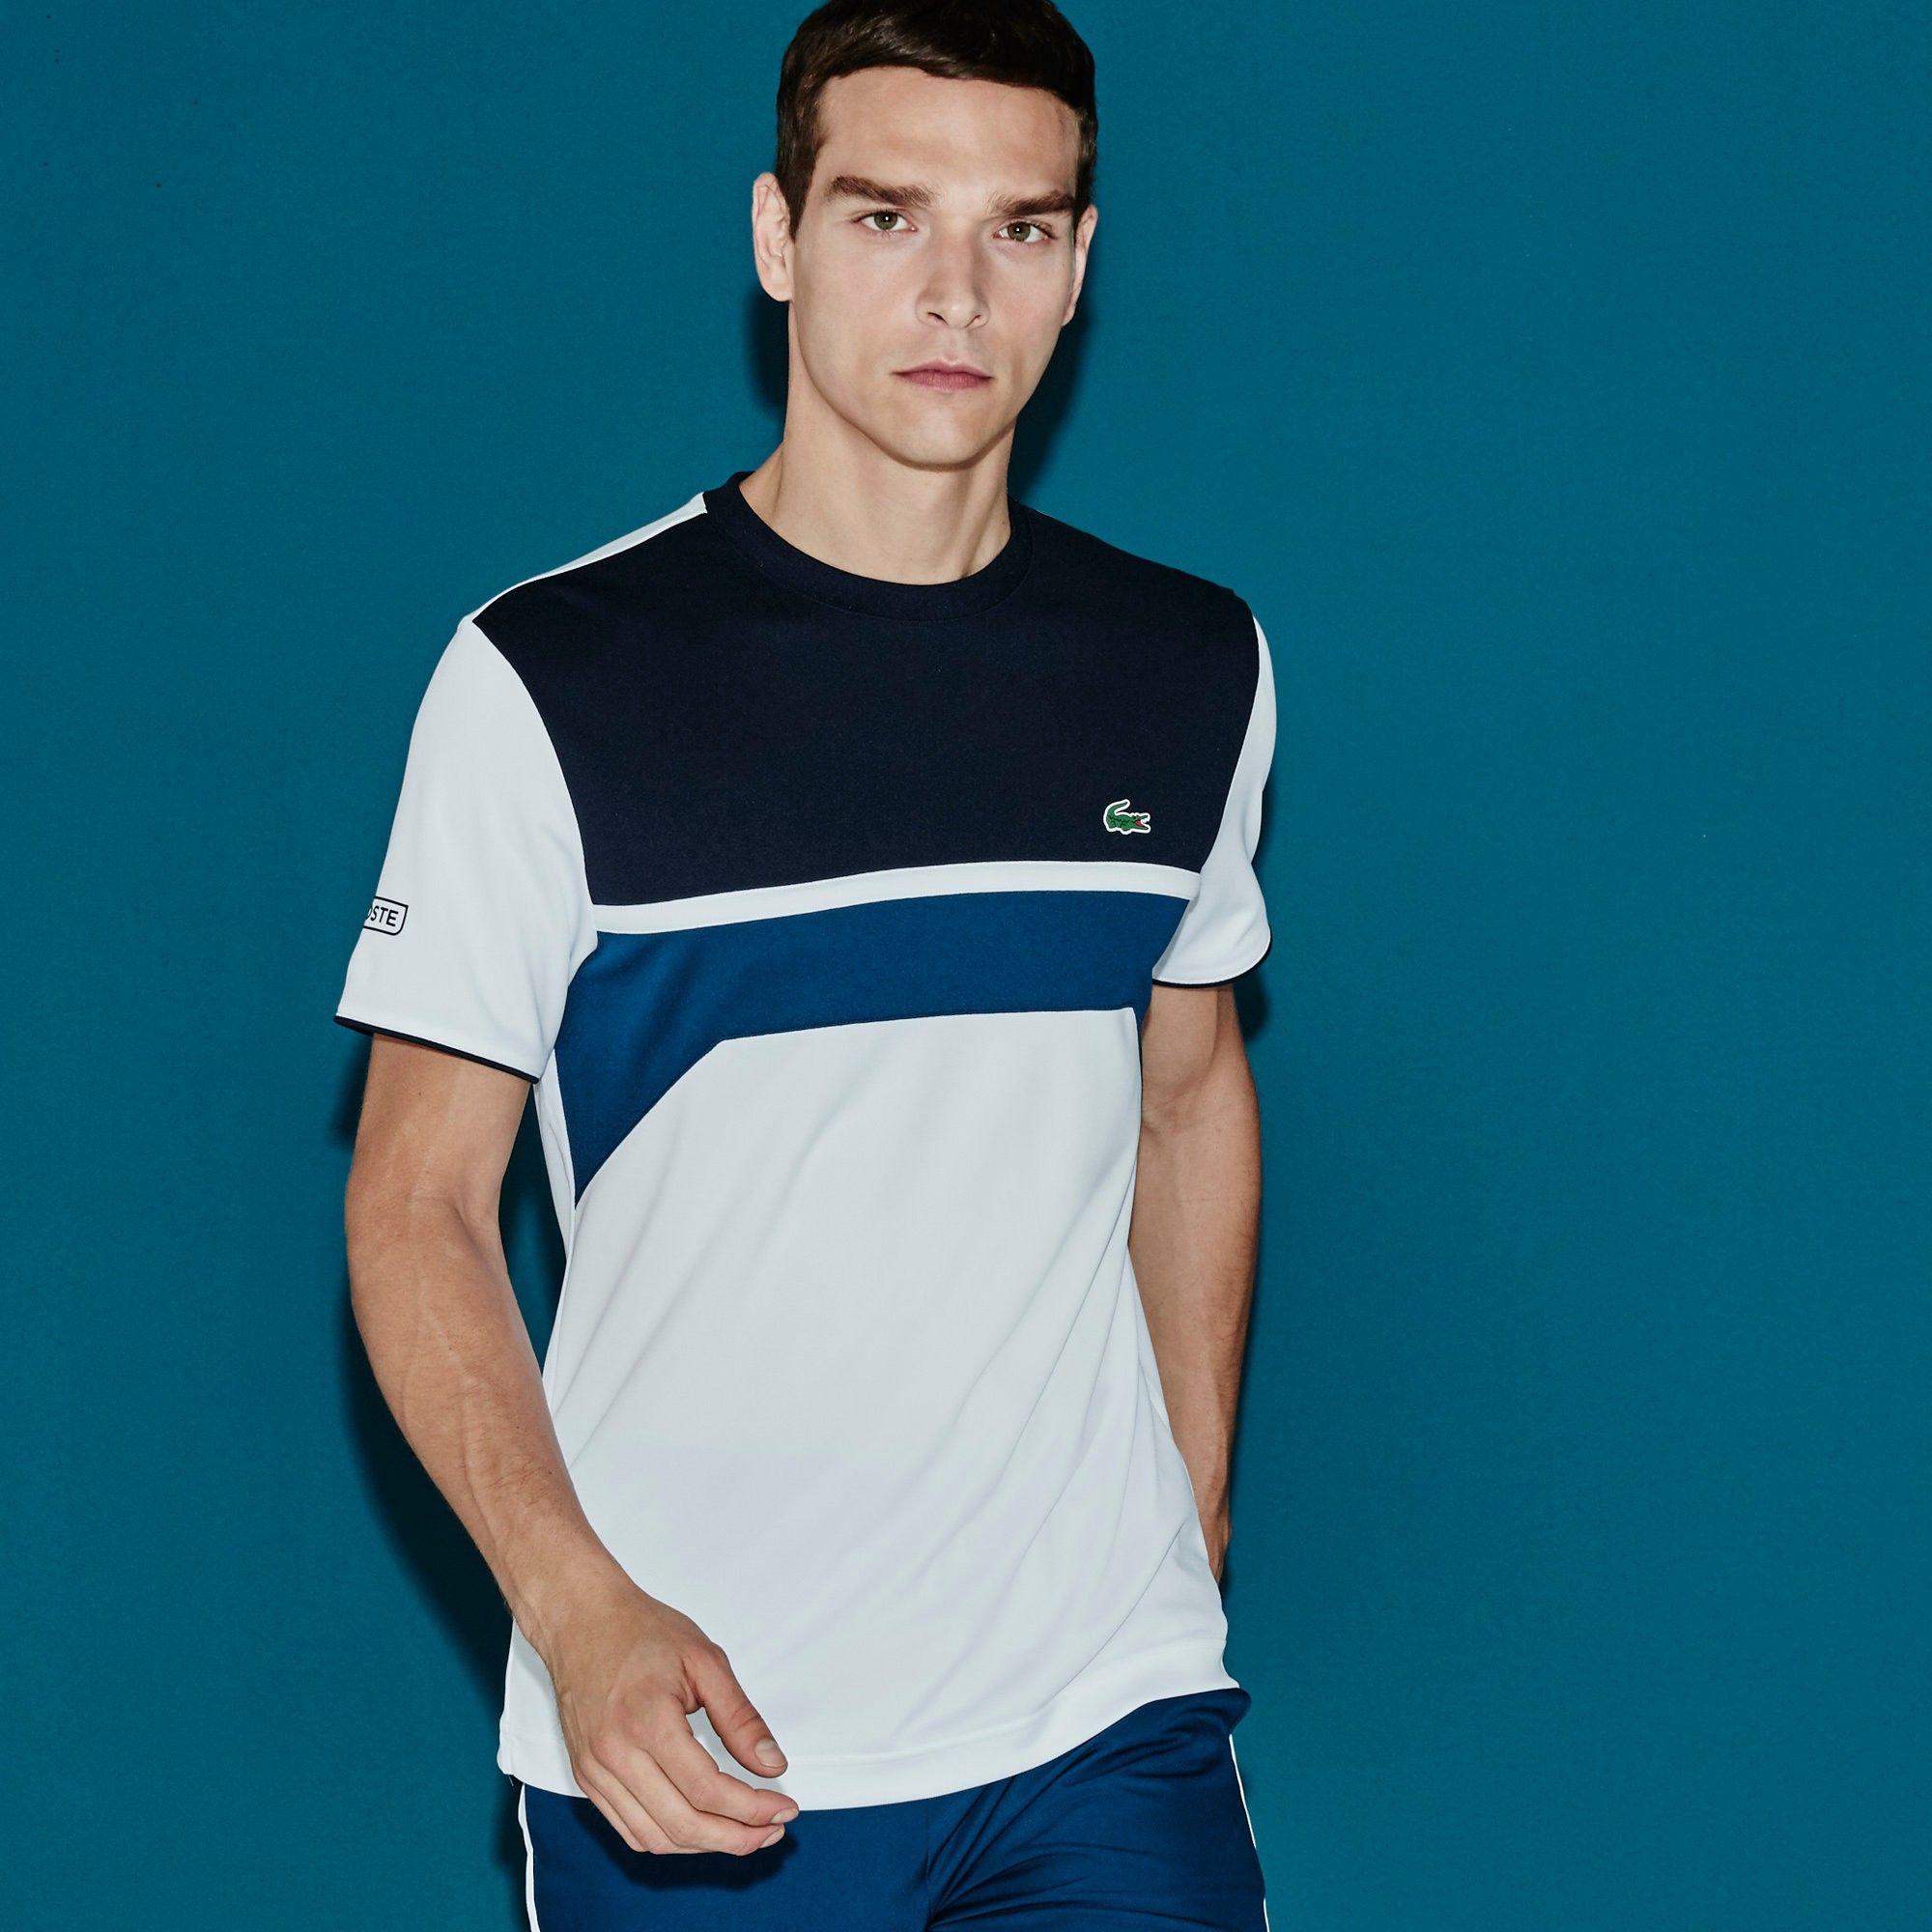 1e7671e4 LACOSTE Men's SPORT Ultra Dry Chest Stripe Tennis T-Shirt ...